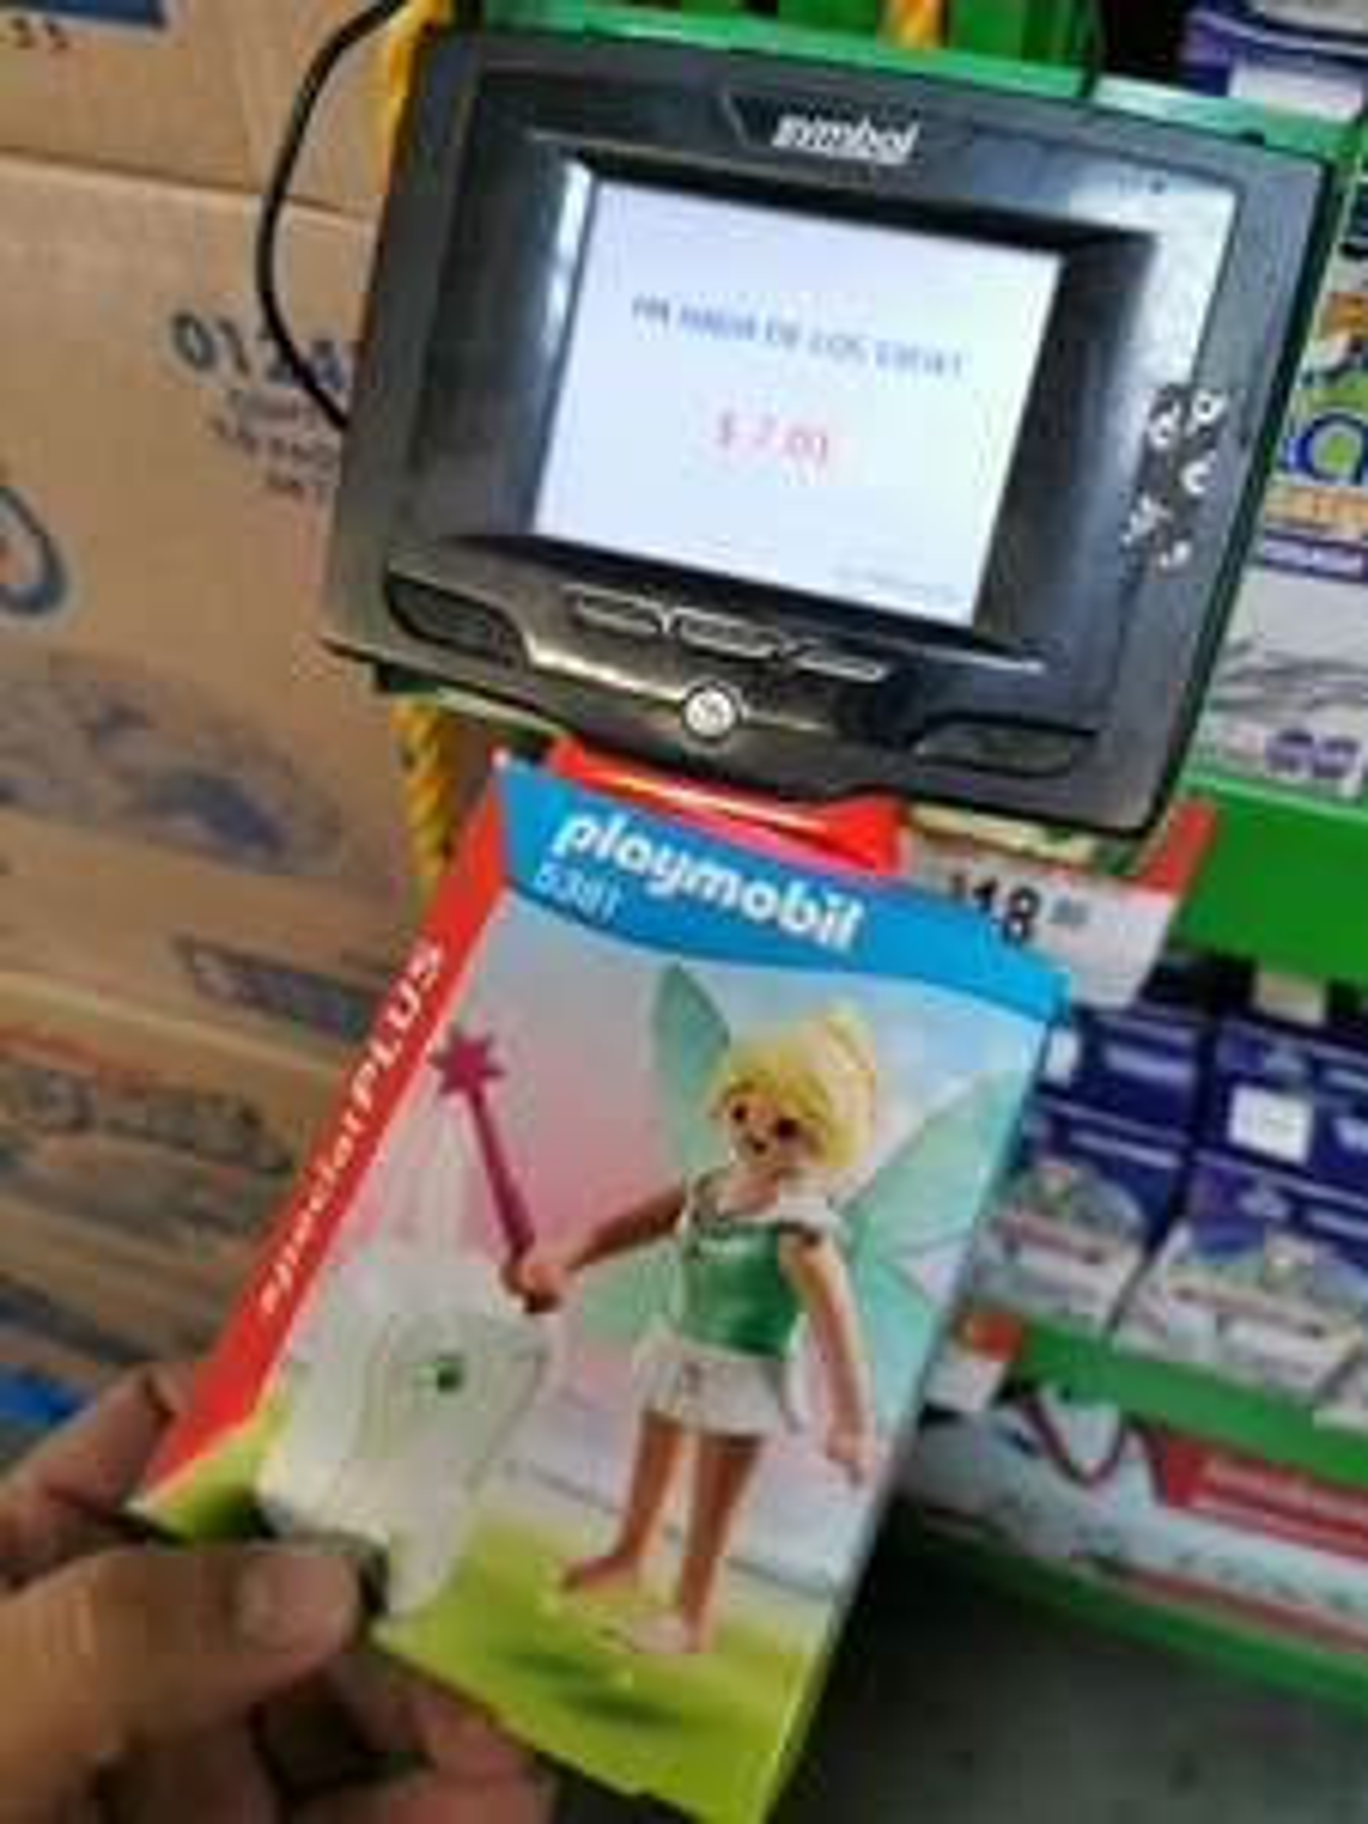 Bodega Aurrerá: Playmobil en liquidación